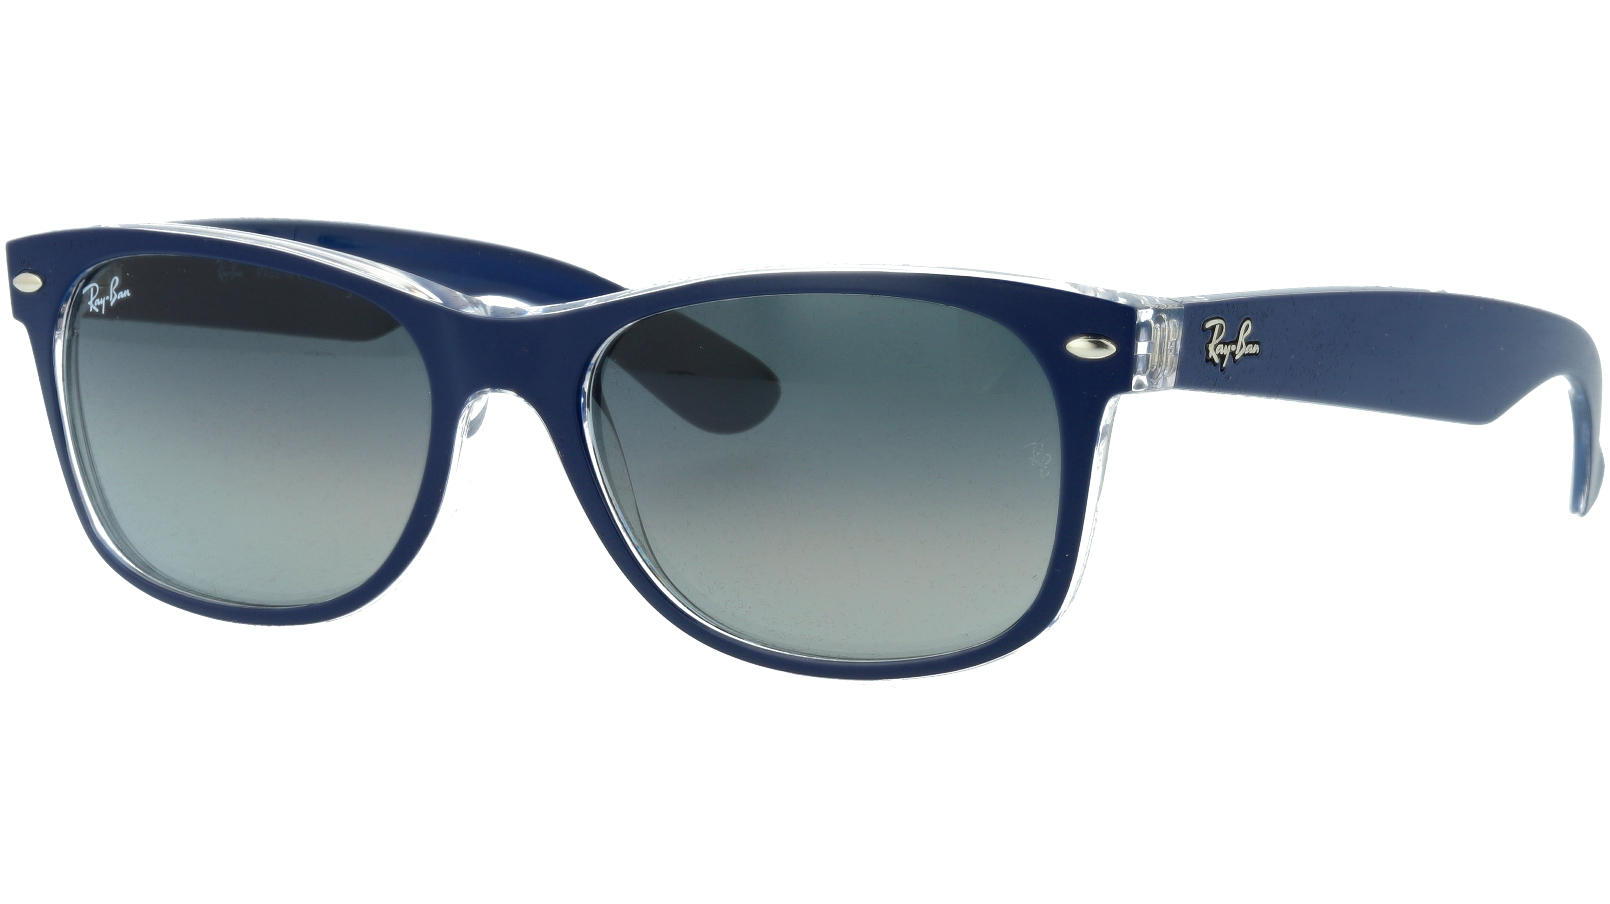 Ray-Ban RB2132 605371 55 Matte Wayfarer Sunglasses